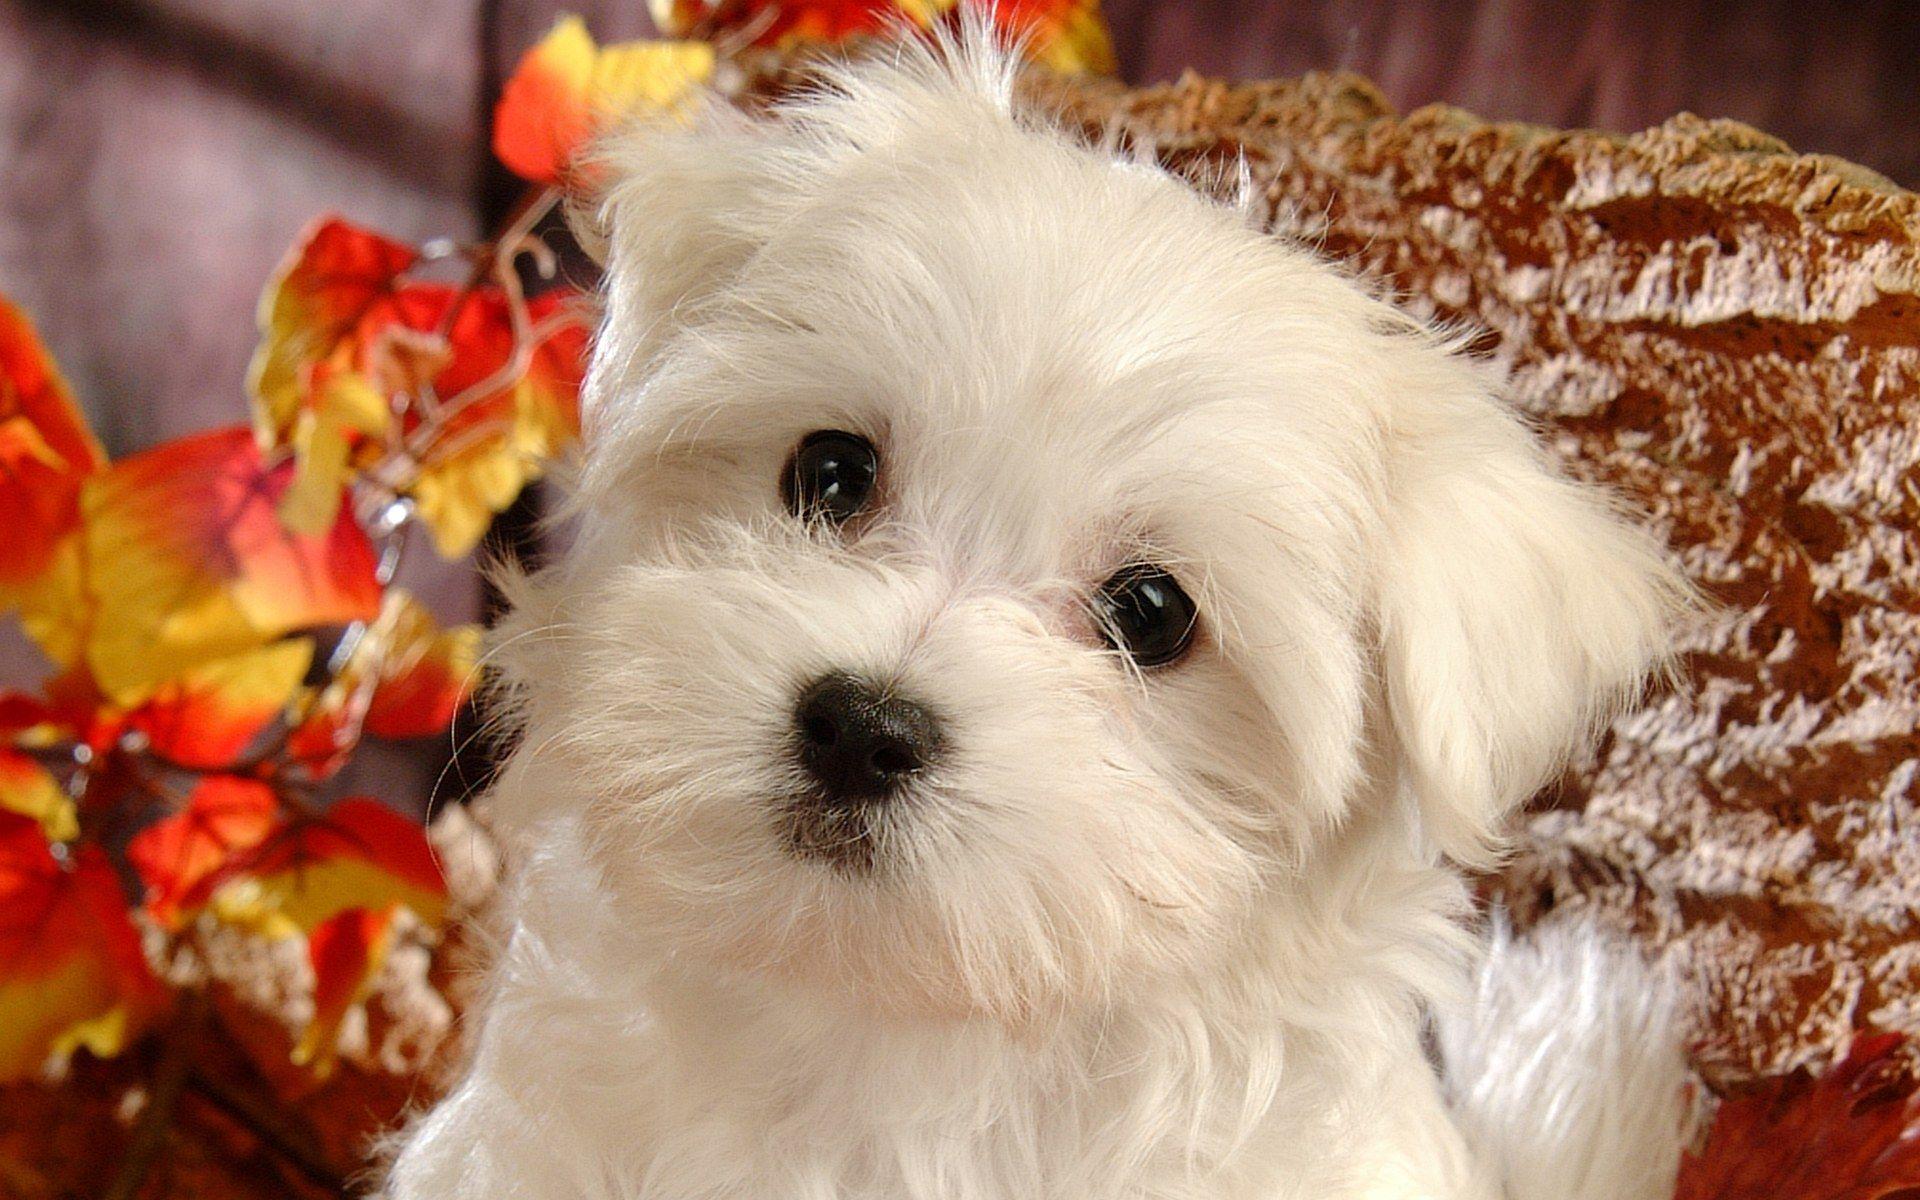 Dog Photos Fluffy Maltese Puppy Dogs White Maltese Puppies